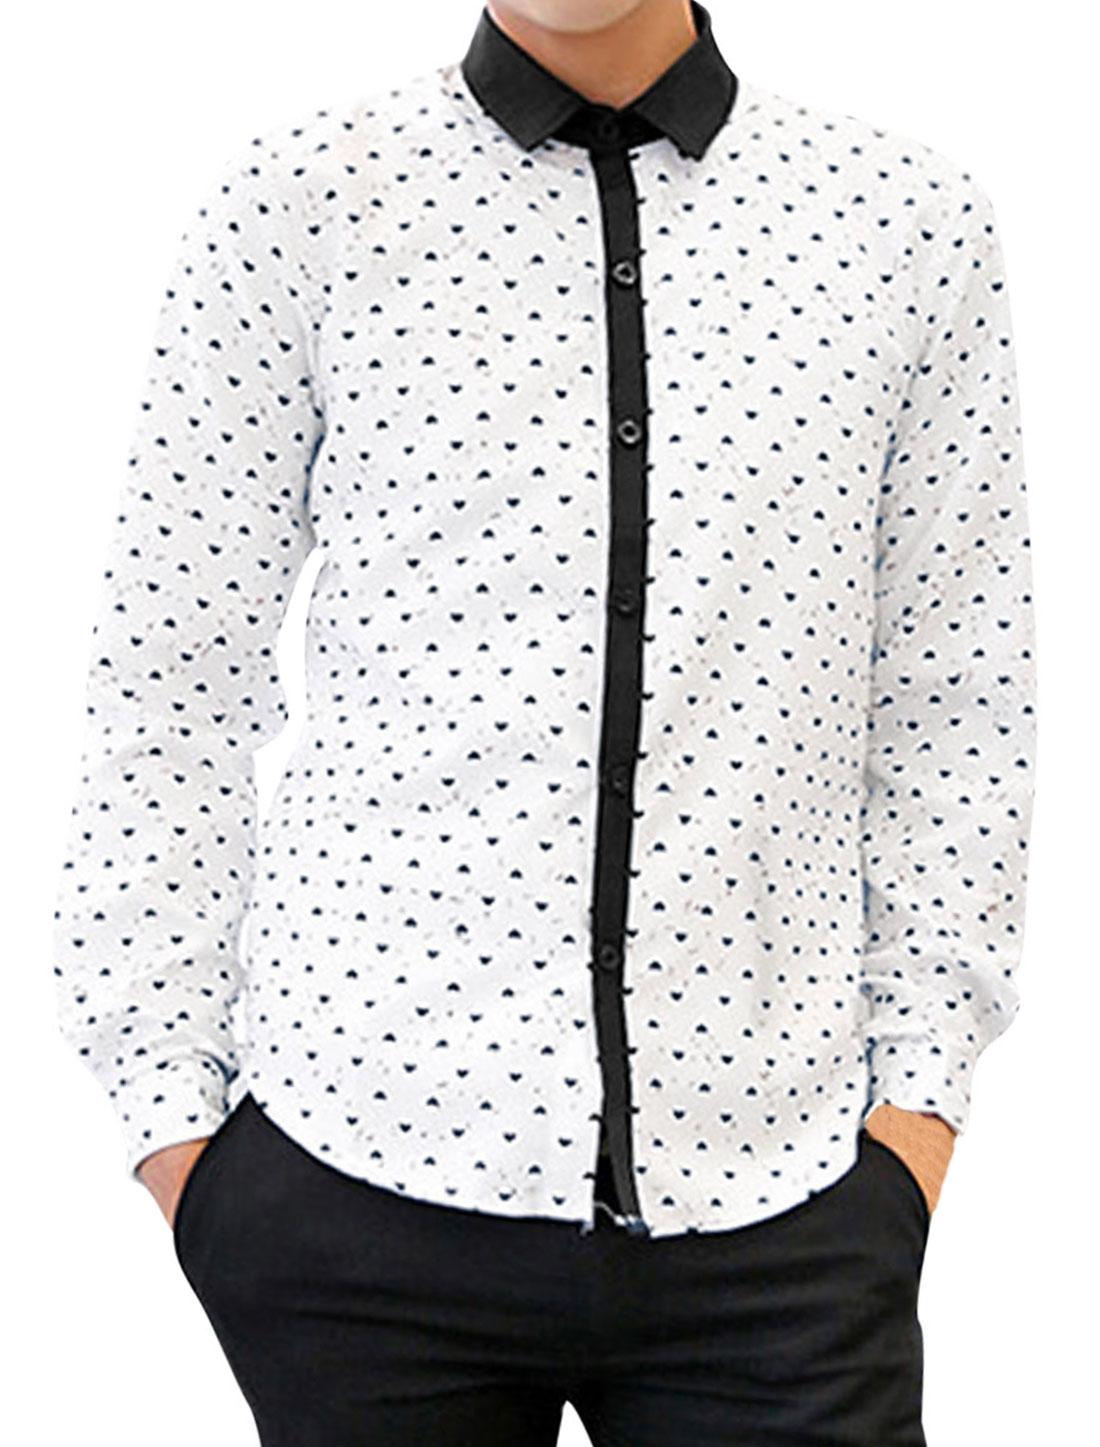 Men Heart Print Contrast Placket Round Hem Panel Fashion Shirt White M